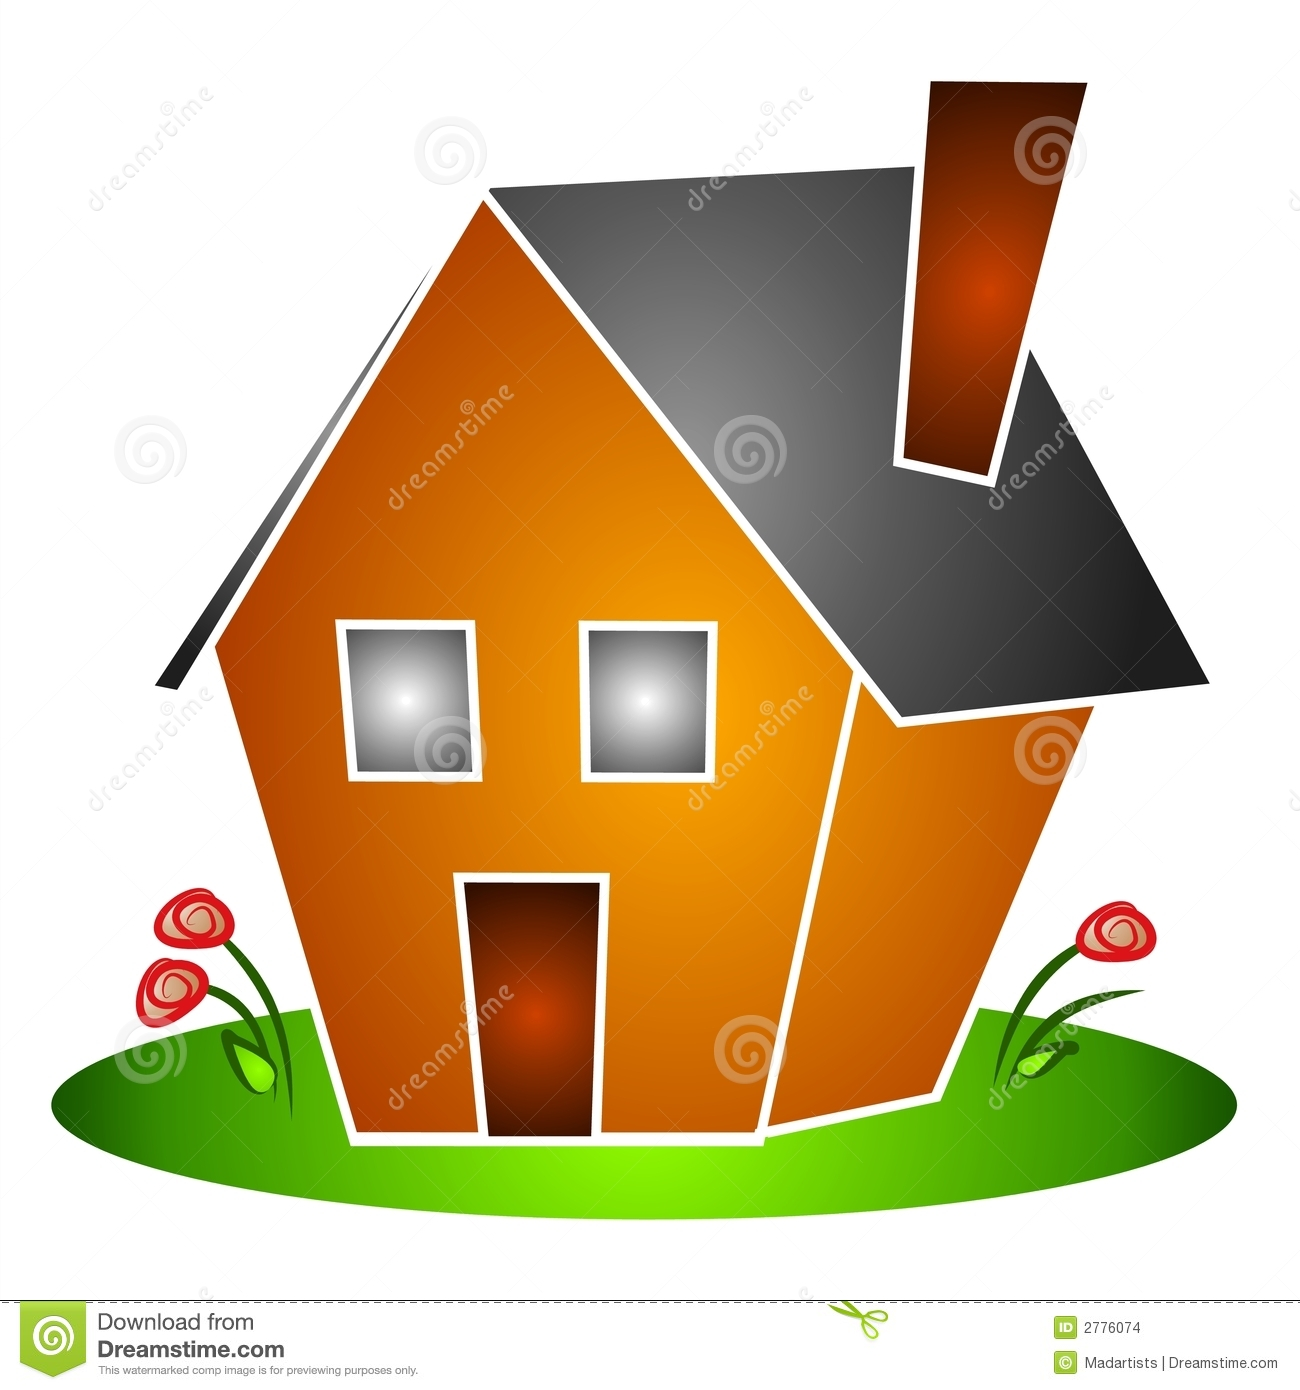 clipart house. 23fb71b8c148bd36c0b9c08857430d .